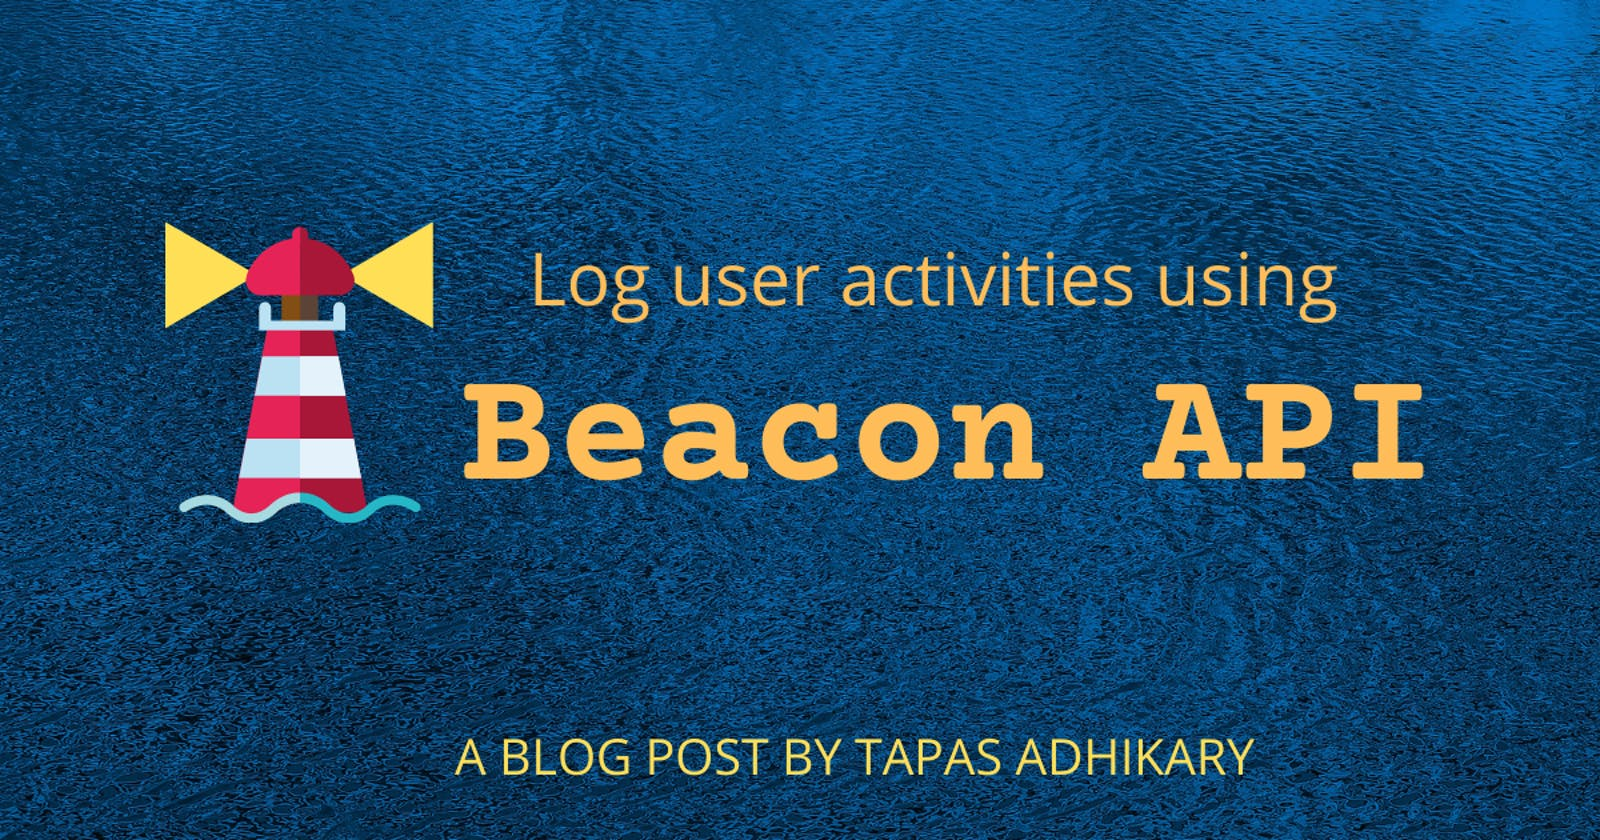 How to log user activities using the Beacon Web API?